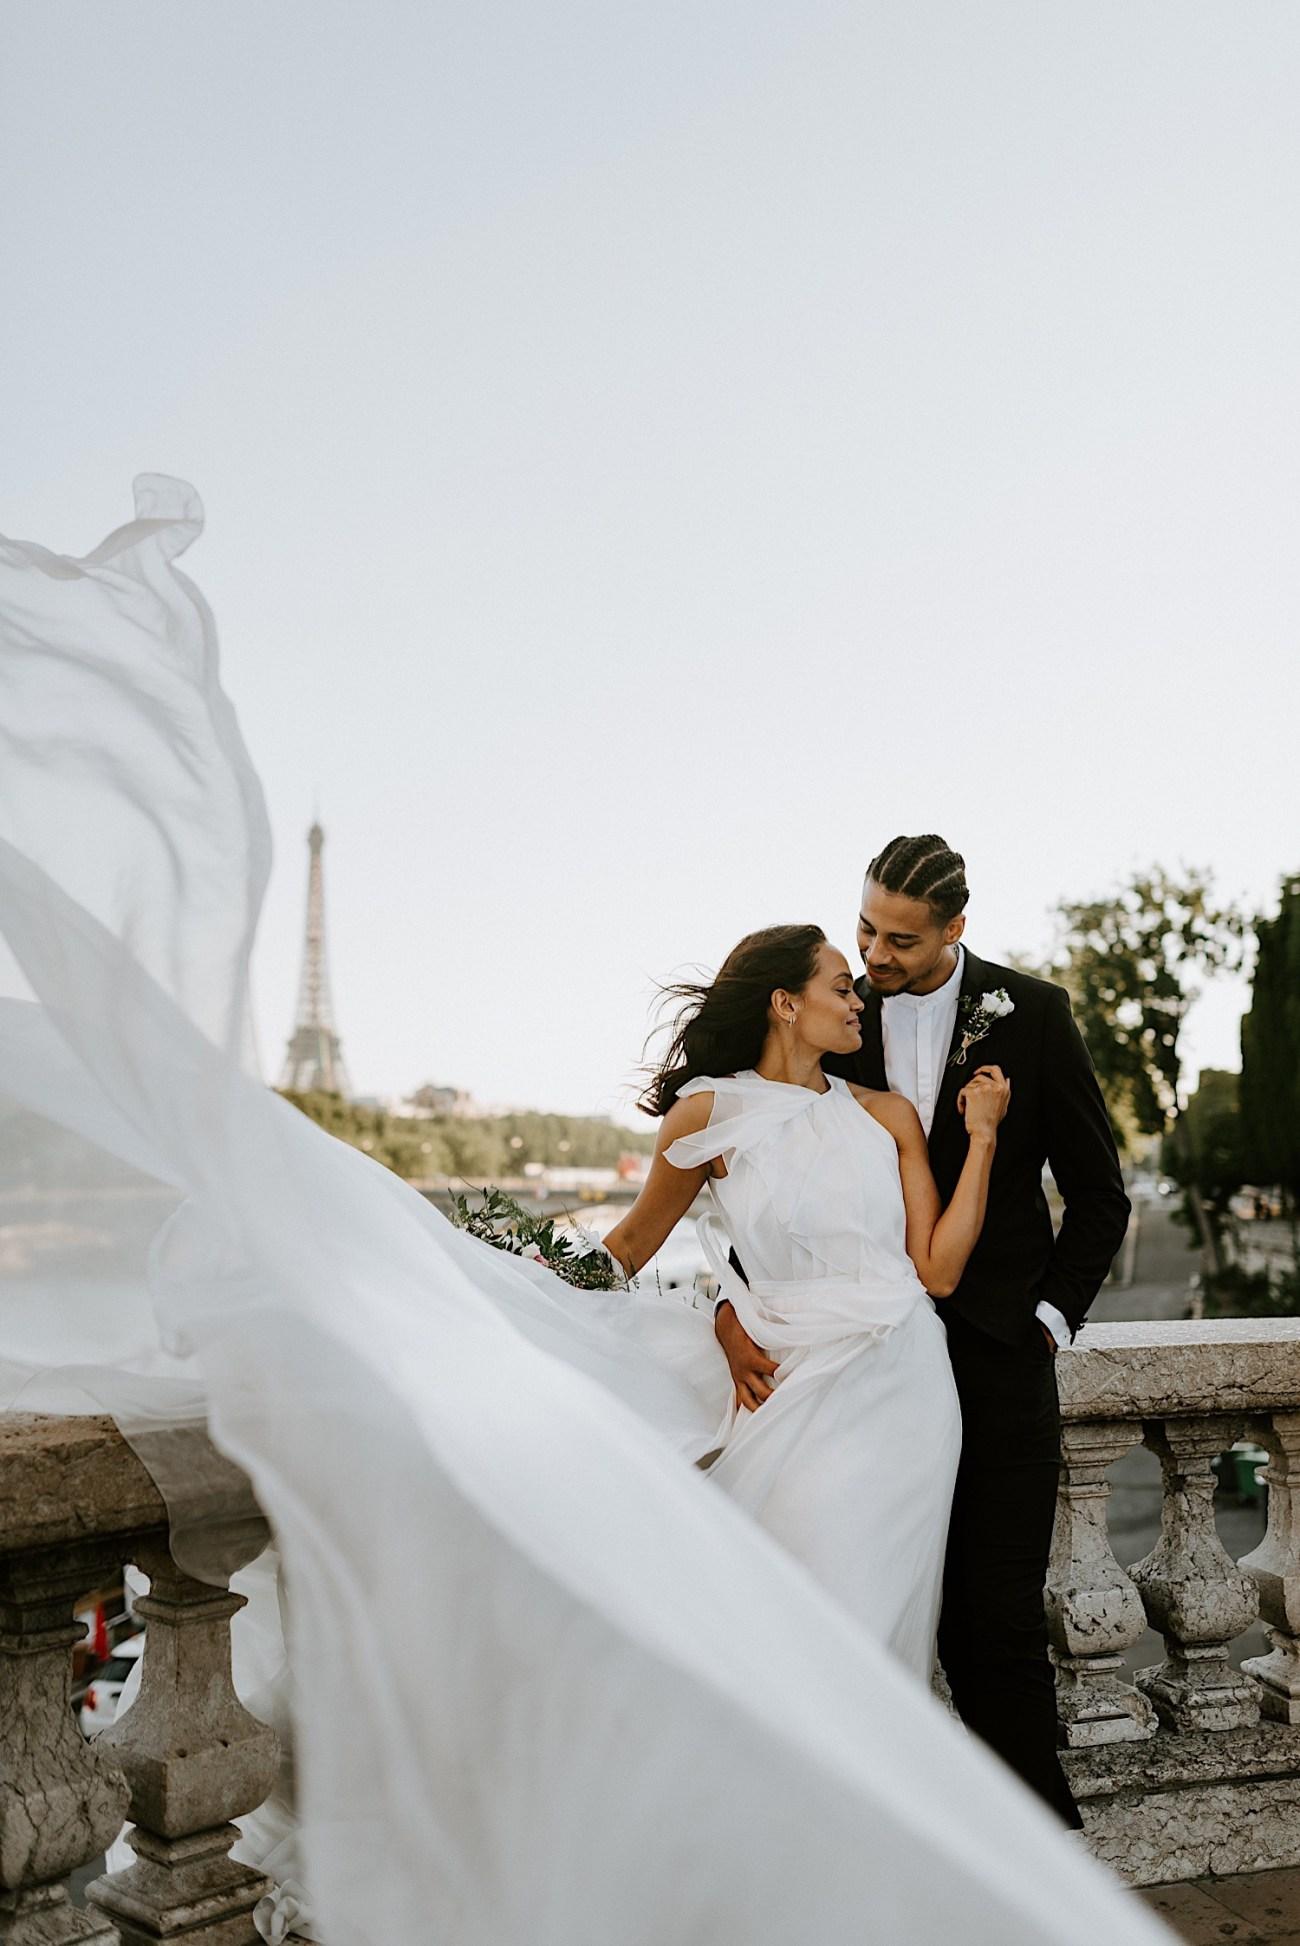 Paris Wedding Photos Paris Wedding Photographer Paris Photographe De Marriage Pont Alexandre Wedding Photos Anais Possamai Photography 16